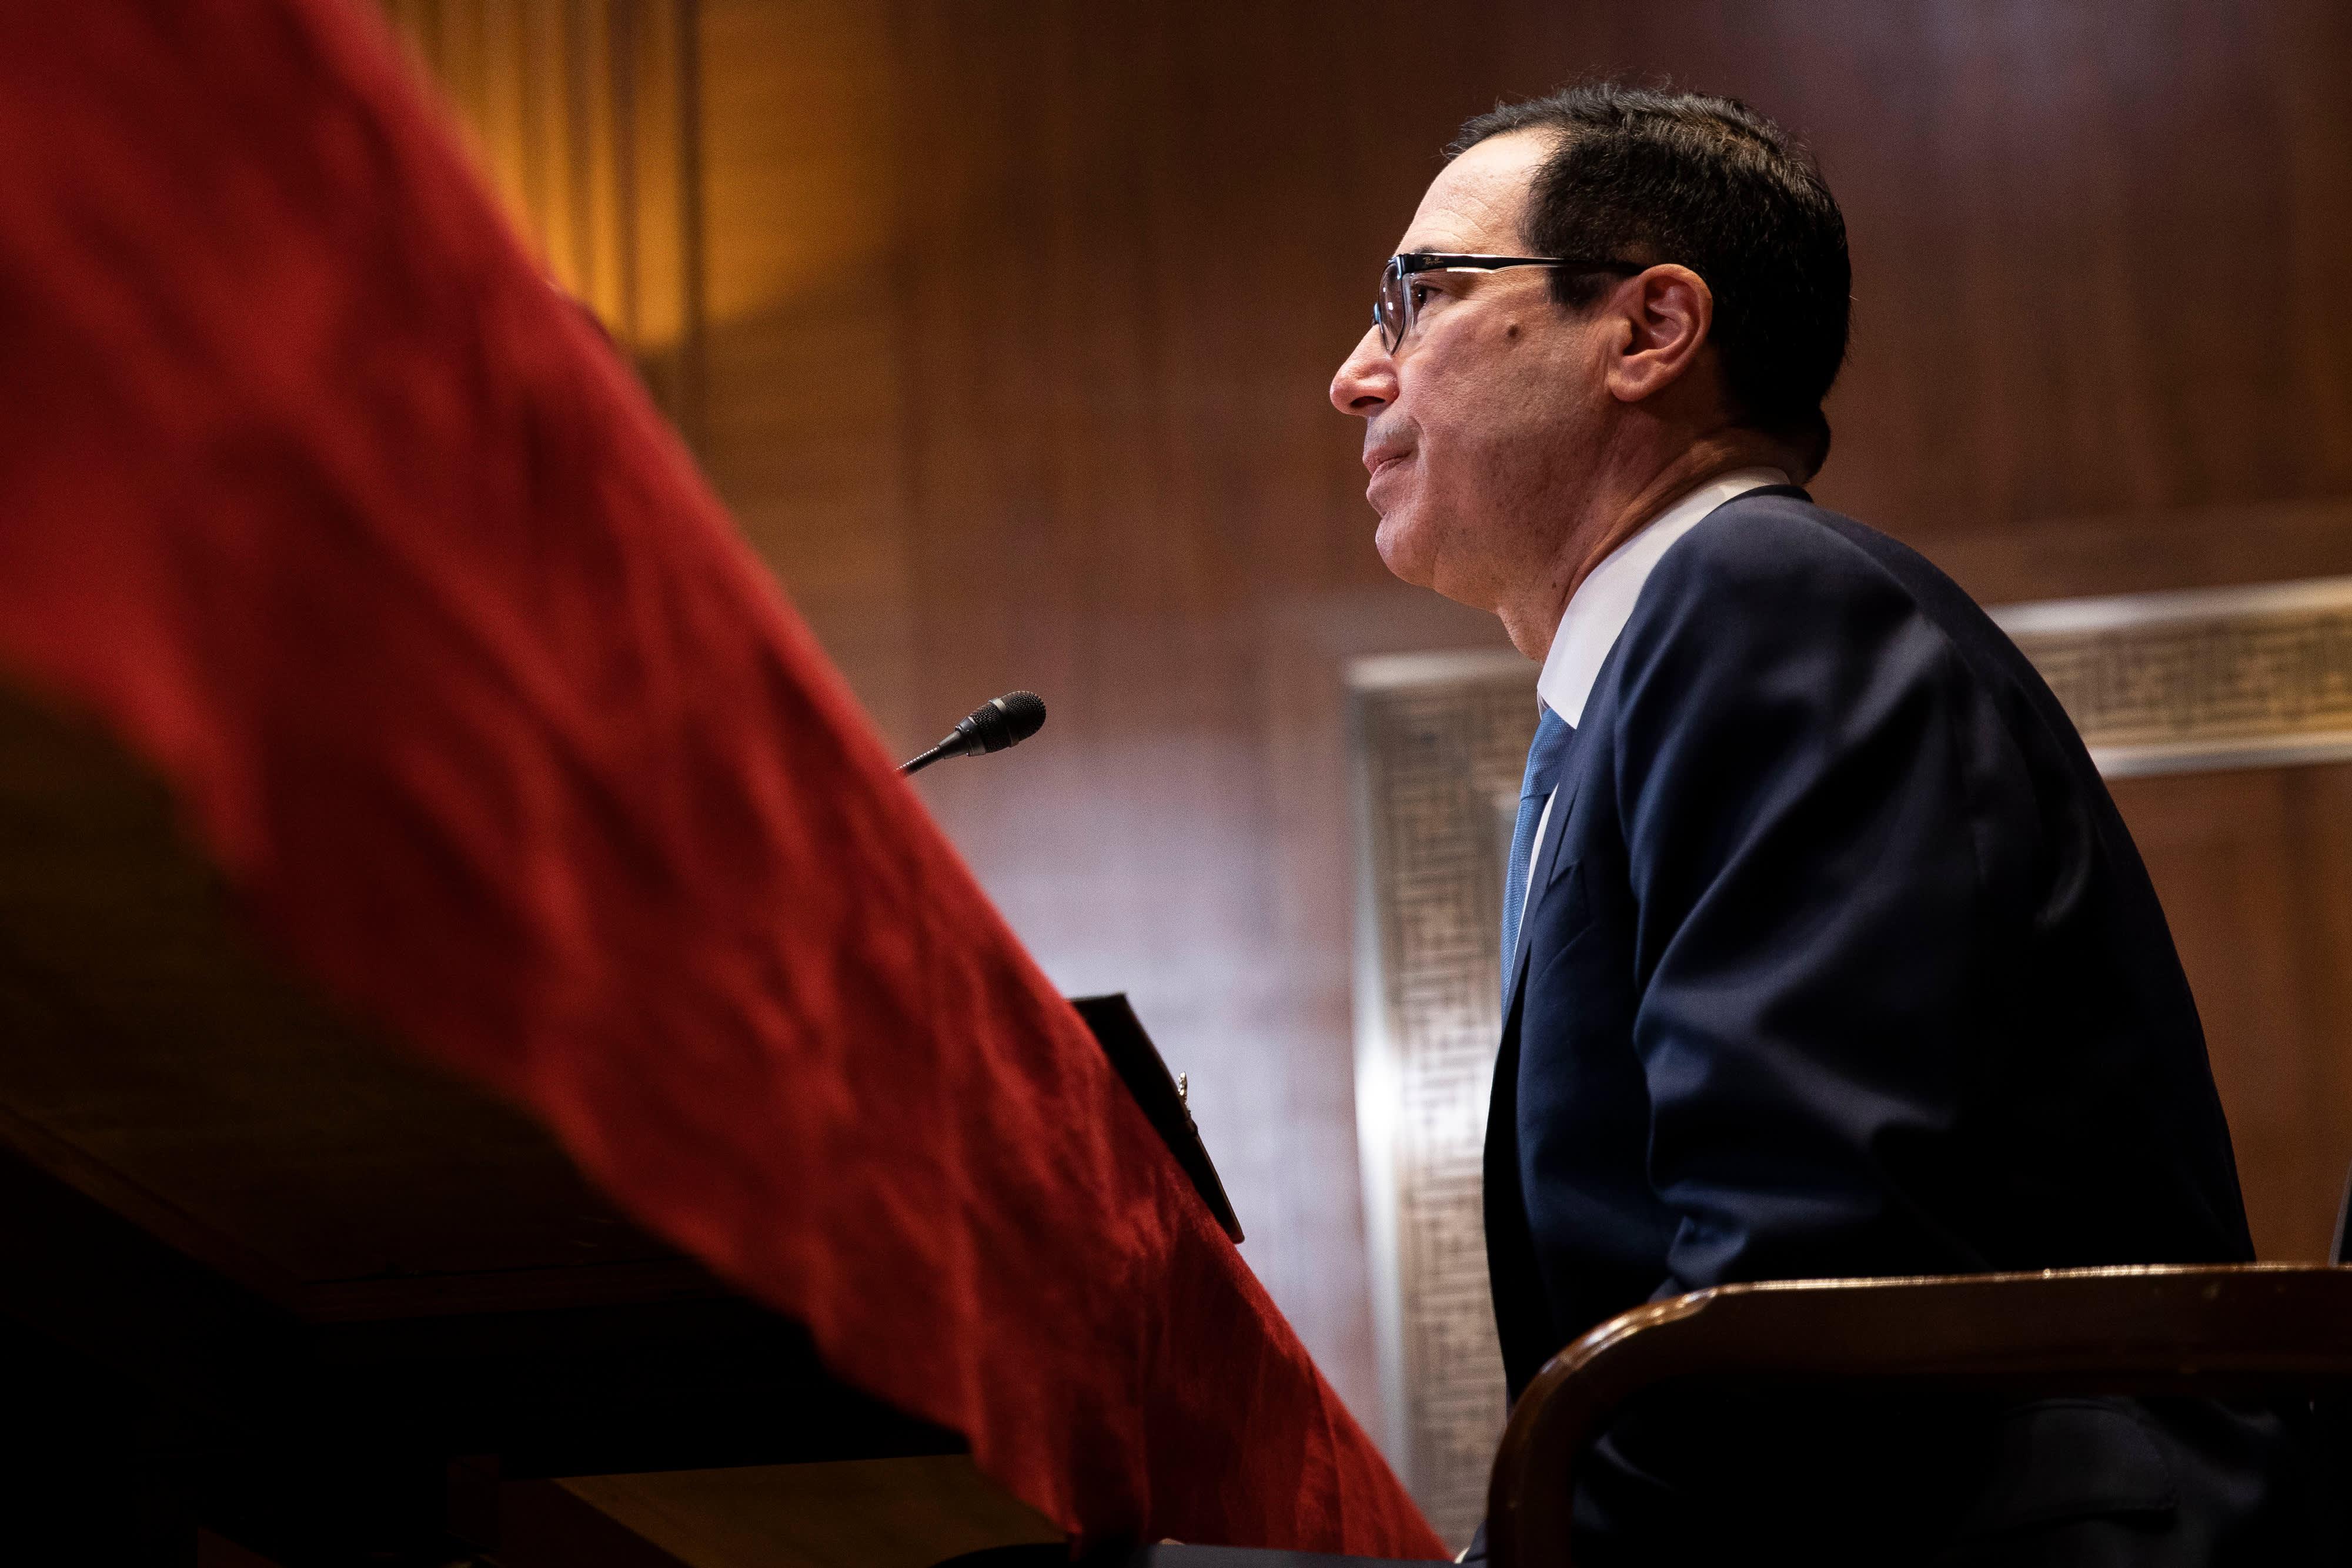 Treasury Secretary Steven Mnuchin and IRS chief expected to ignore subpoena deadline for Trump's tax returns, setting up court fight